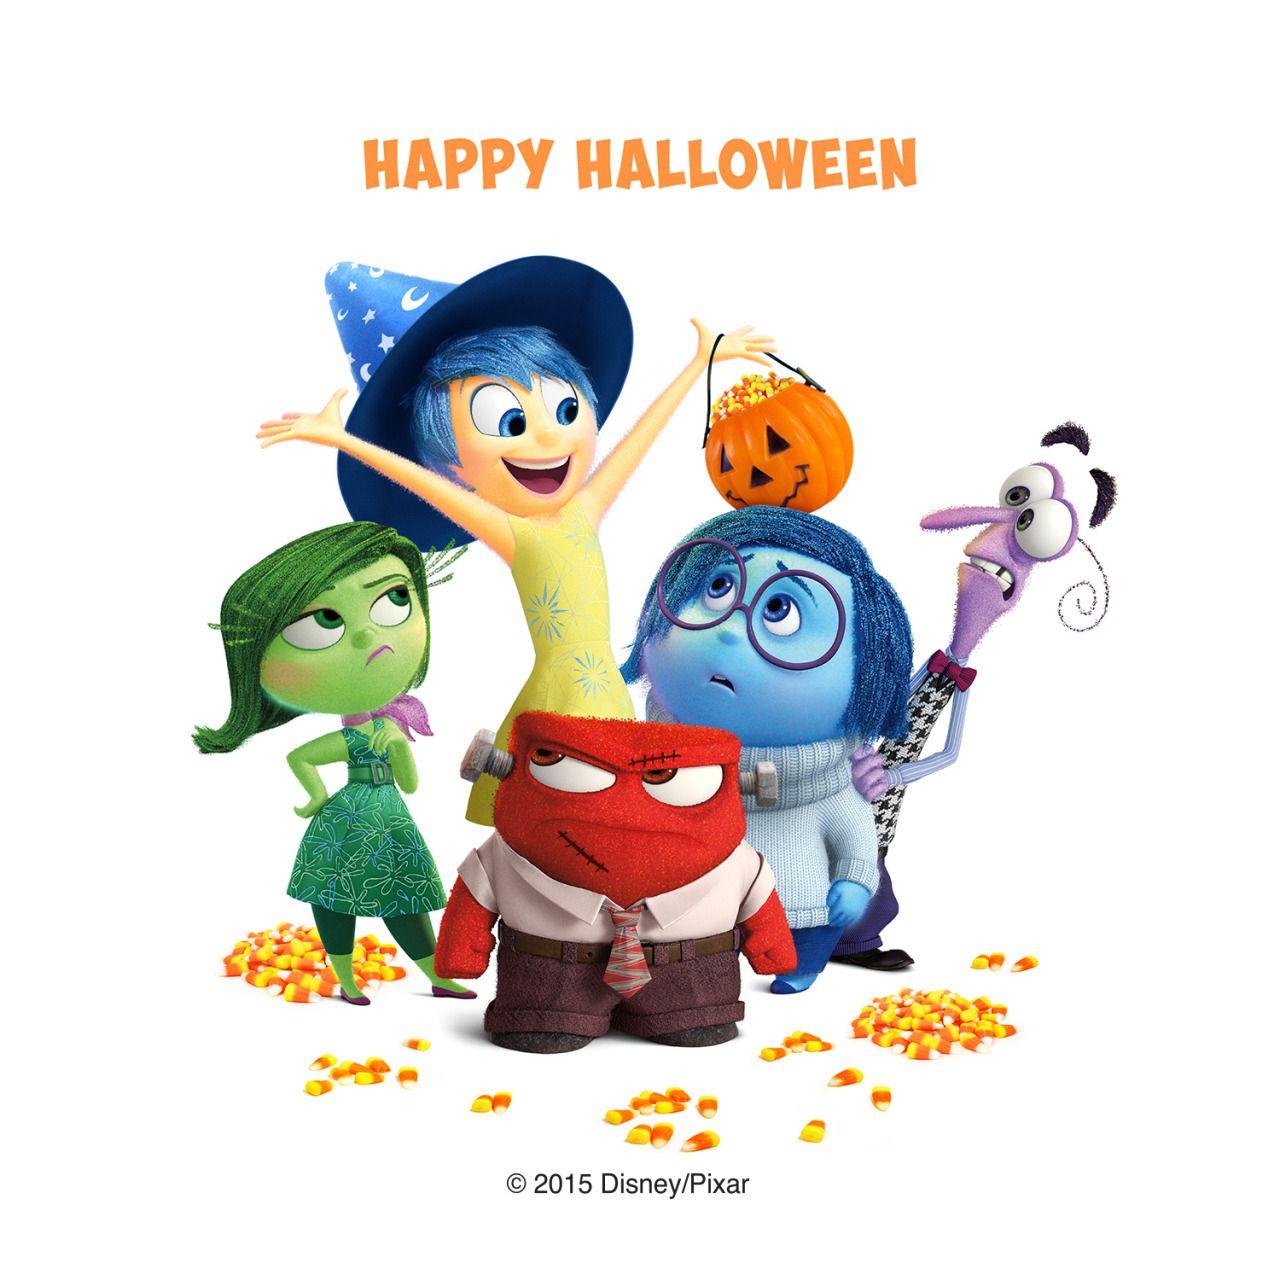 Happy Halloween! Disney pixar, Walt disney animation